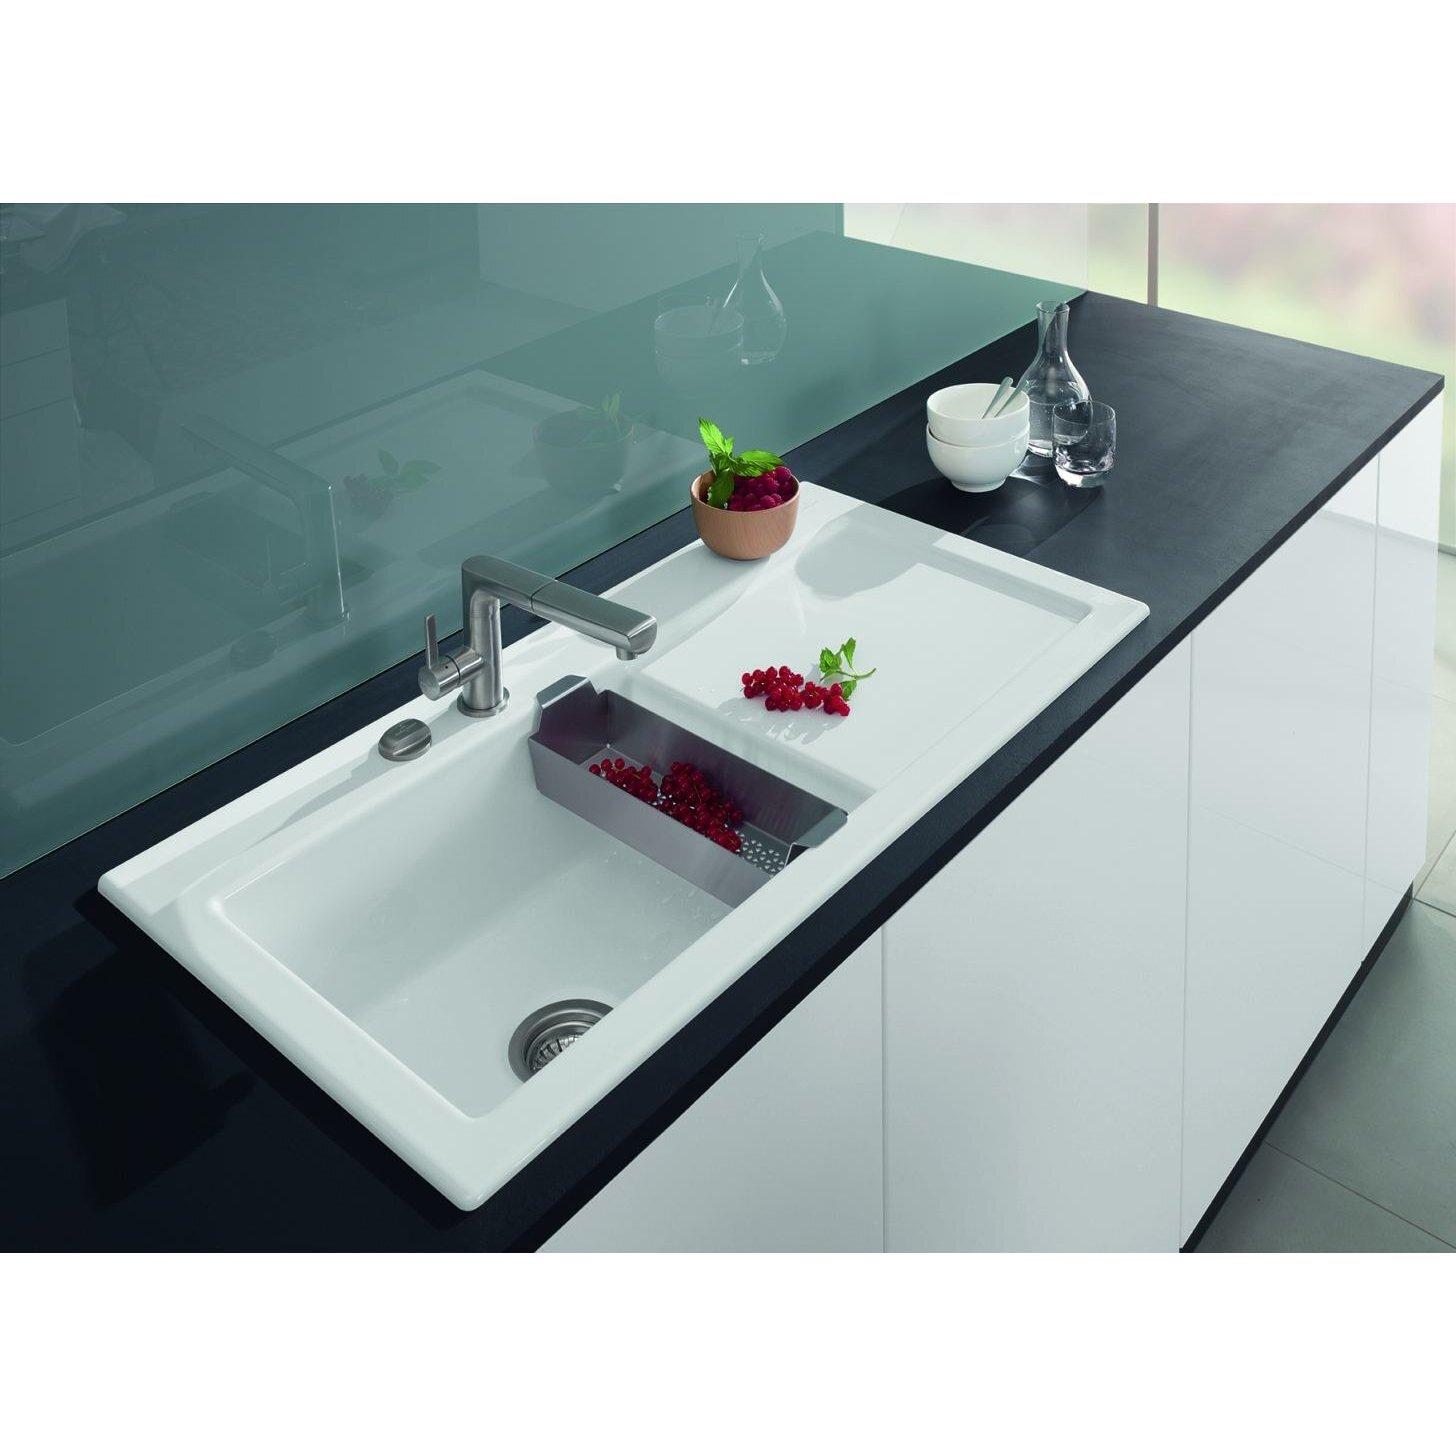 Villeroy & Boch Subway 100cm x 51cm Single Bowl Kitchen Sink ...